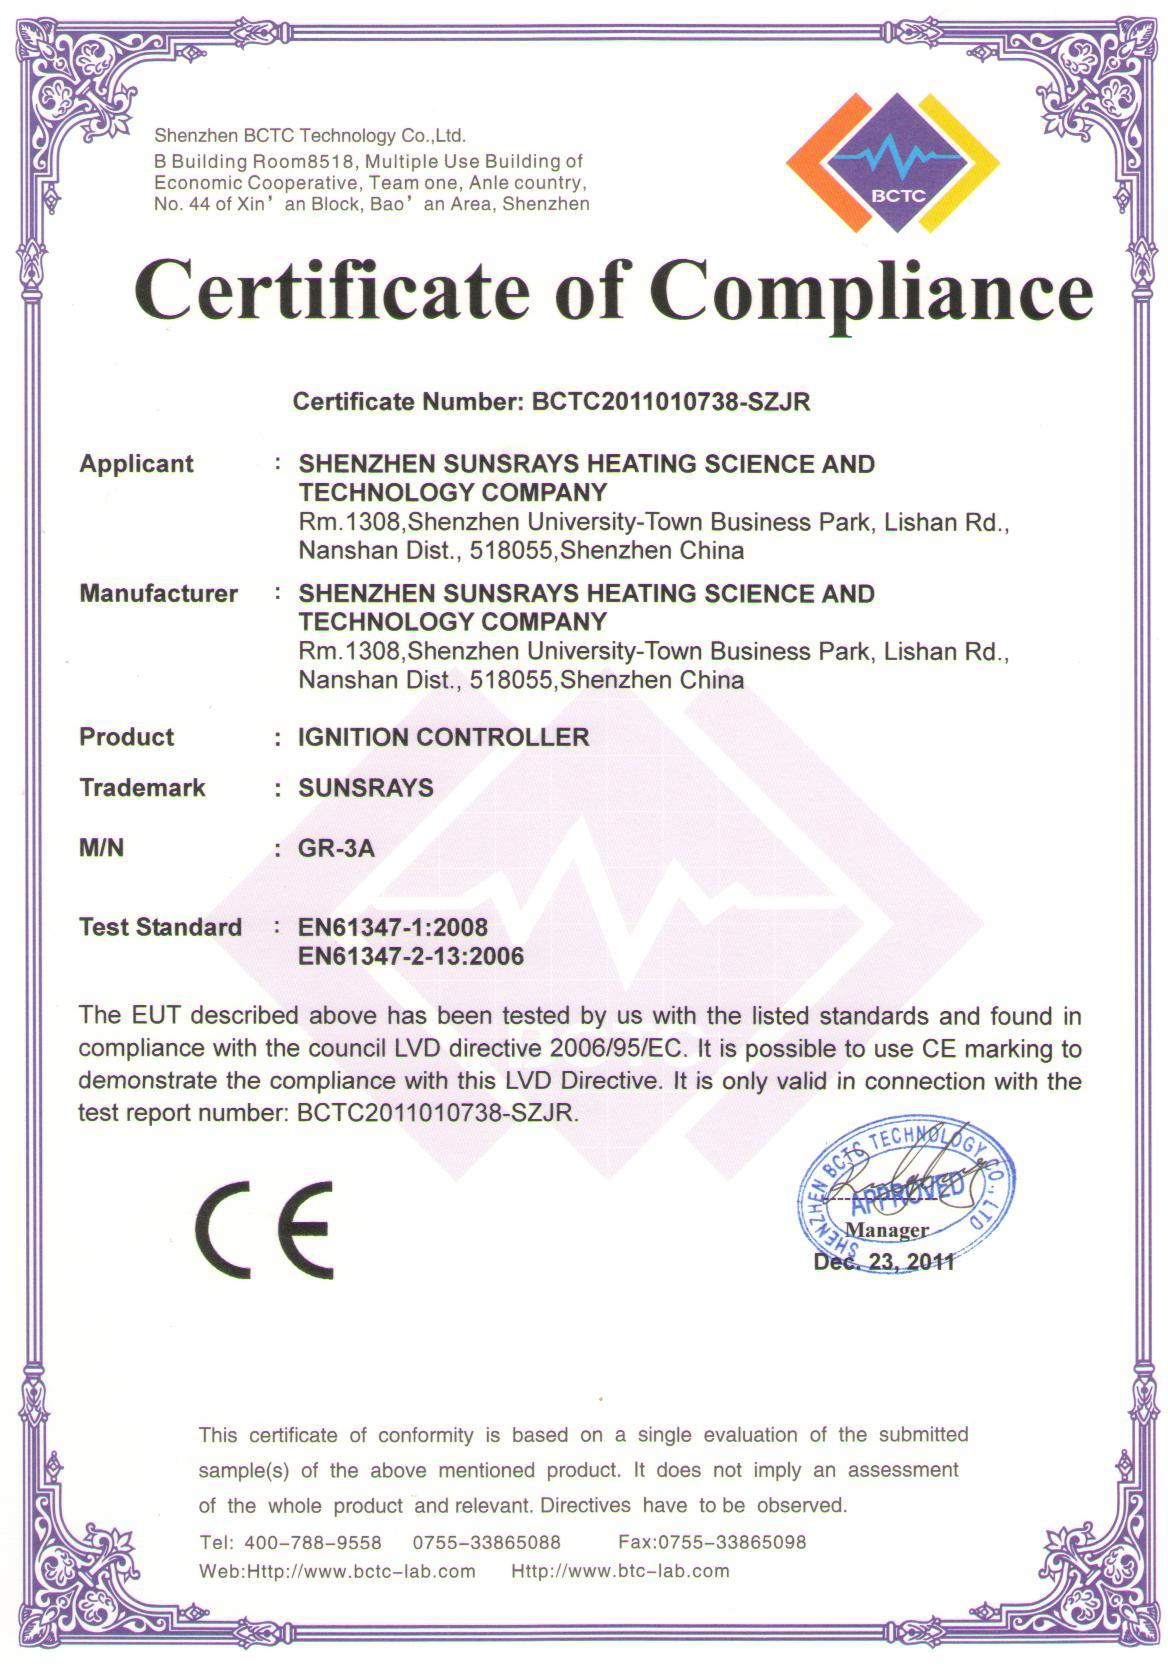 Certificate Of Compliance Template Manufacturing – Certificate of Compliance Template